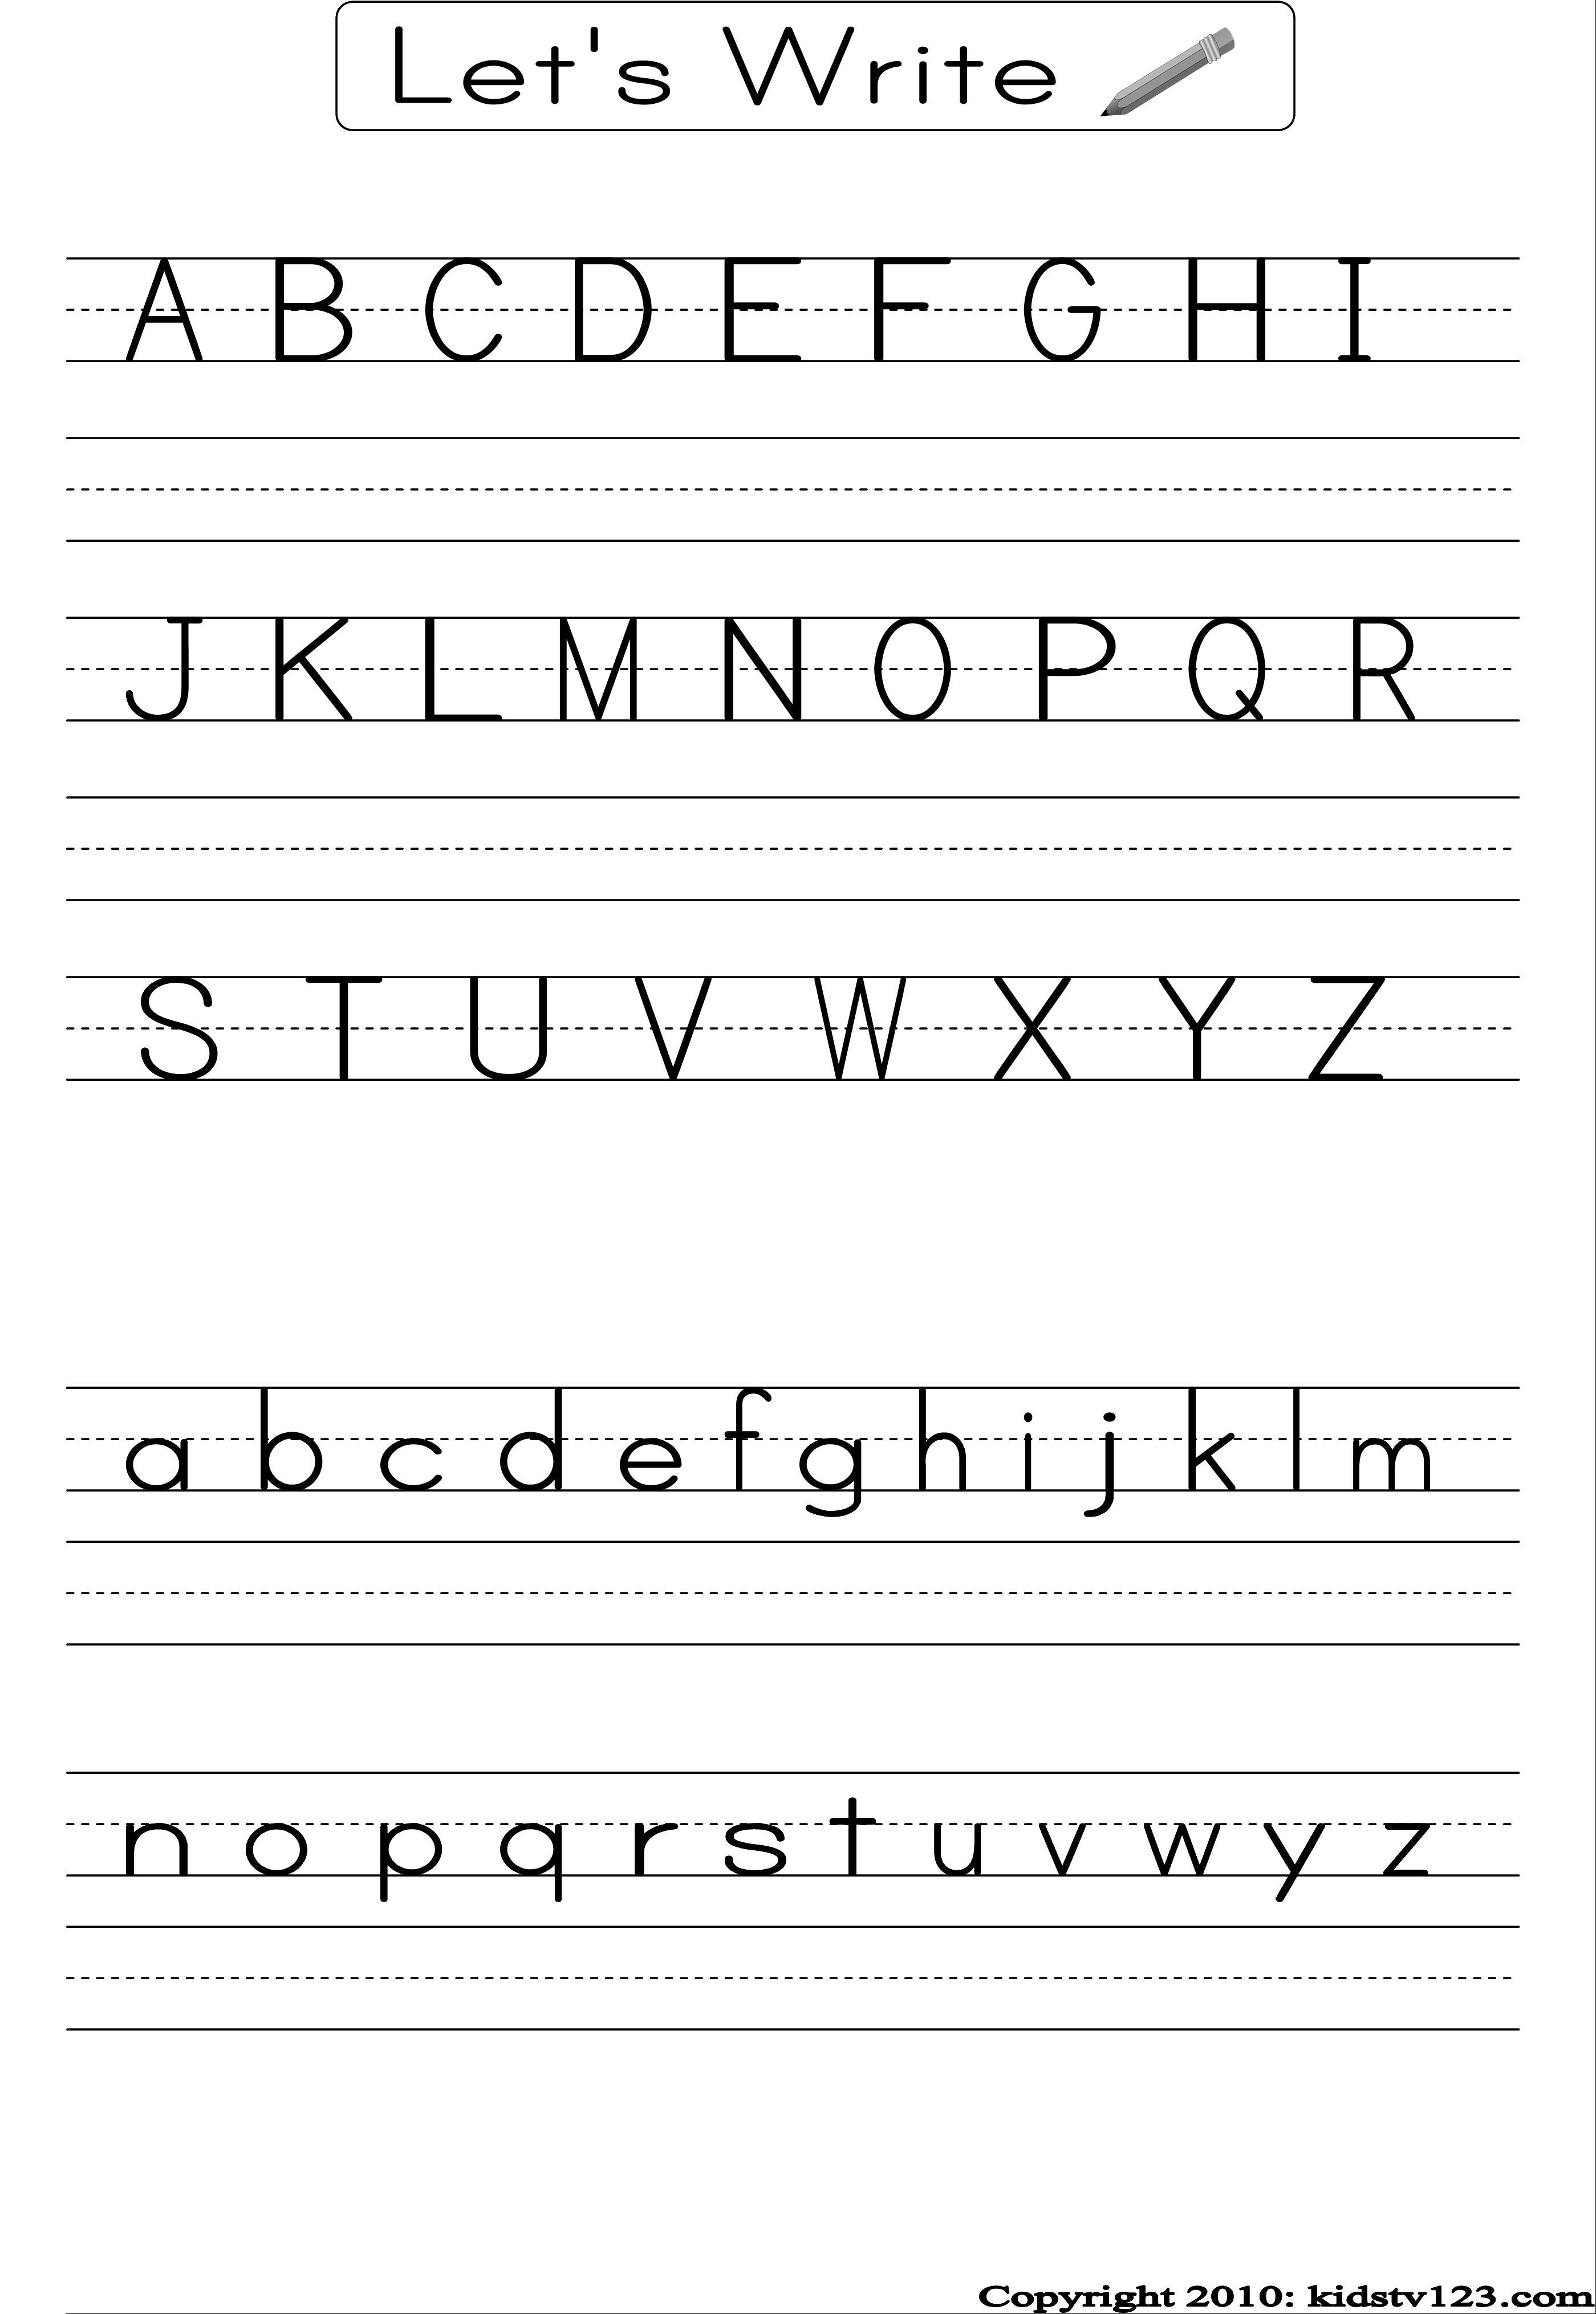 Preschool Alphabet Worksheets Free Printables Alphabet Letters - Free Printable Alphabet Pages